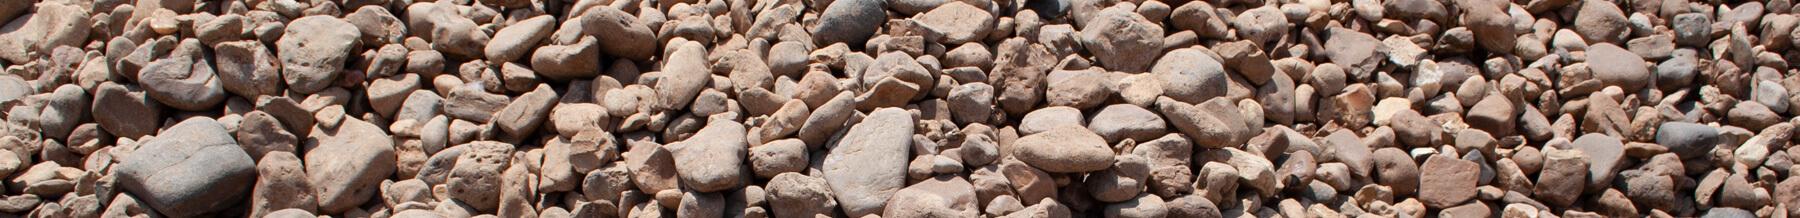 close up wide shot of large river rock